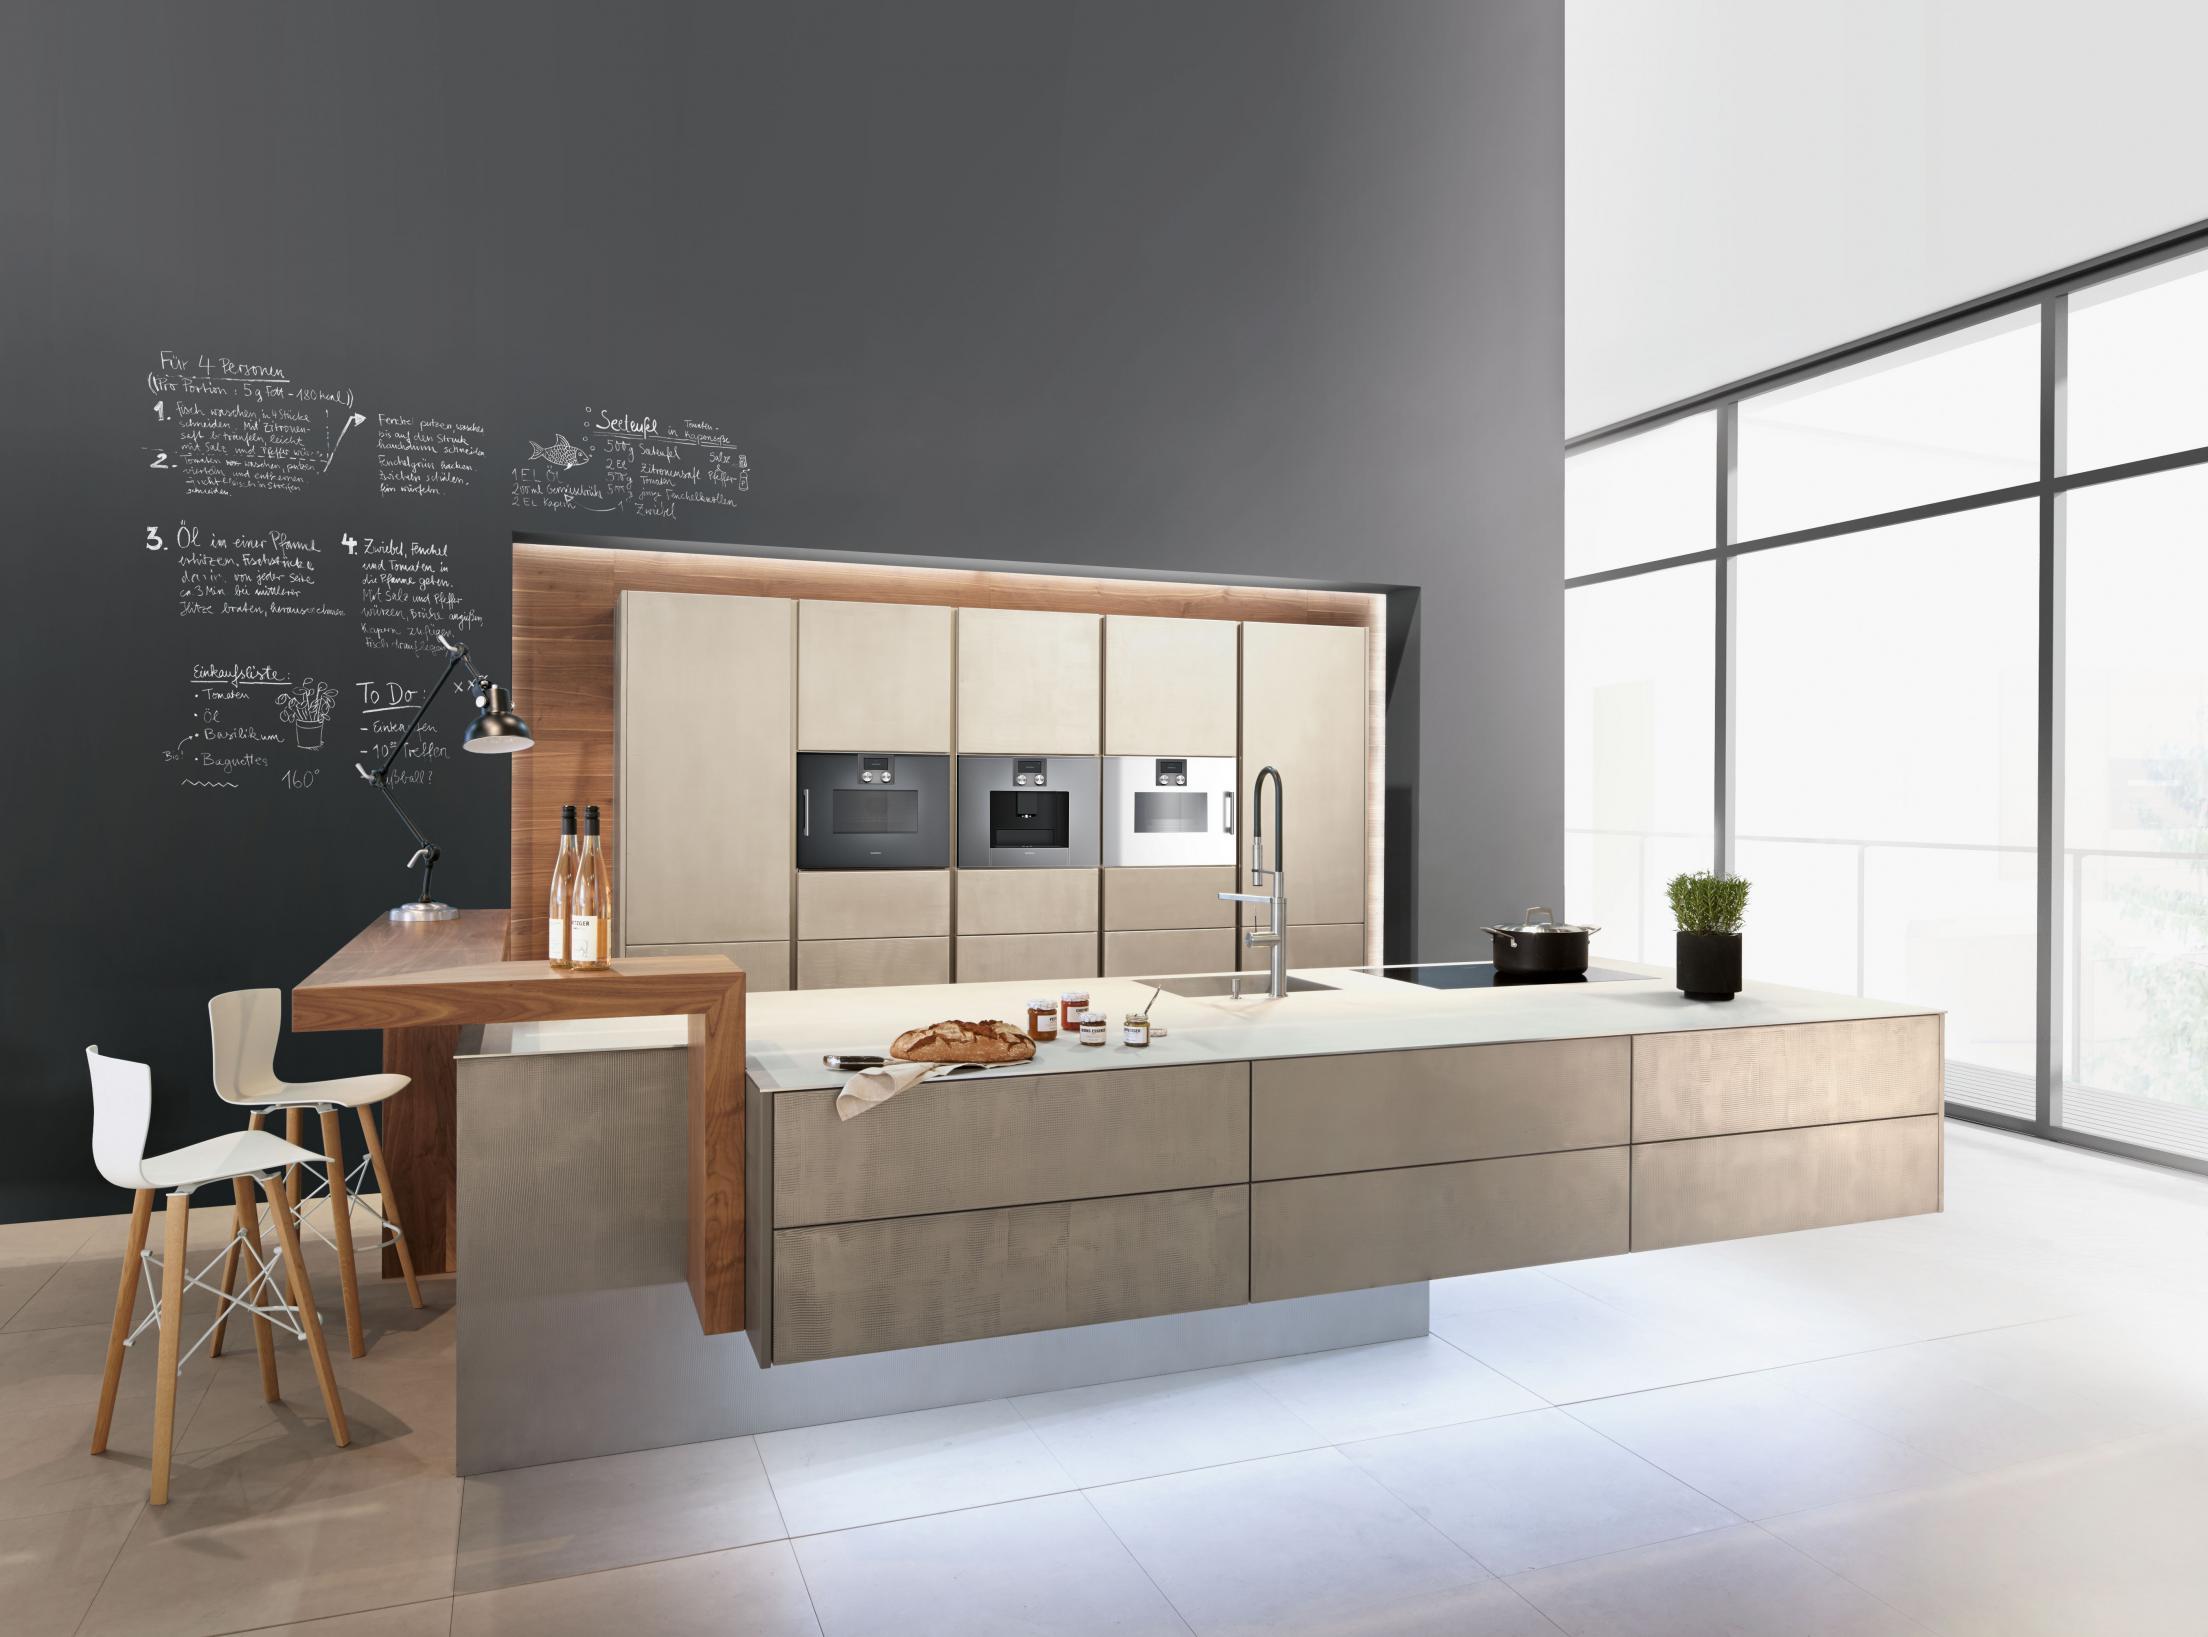 zeyko Flybridge - Special Mention Kitchen